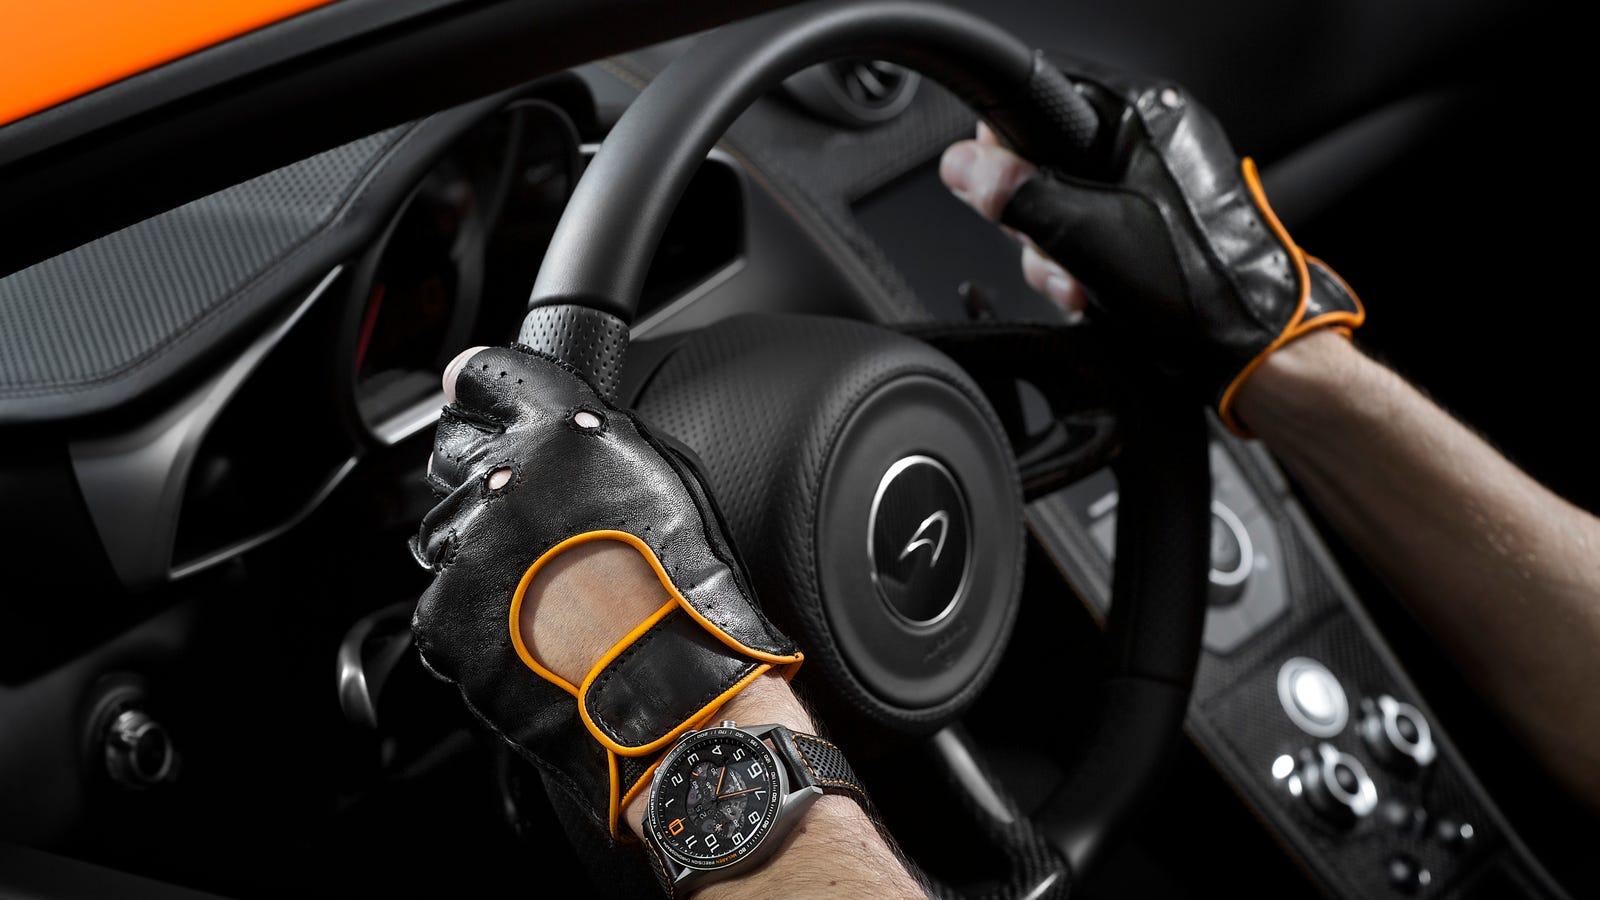 Driving gloves jalopnik - Driving Gloves Jalopnik 4